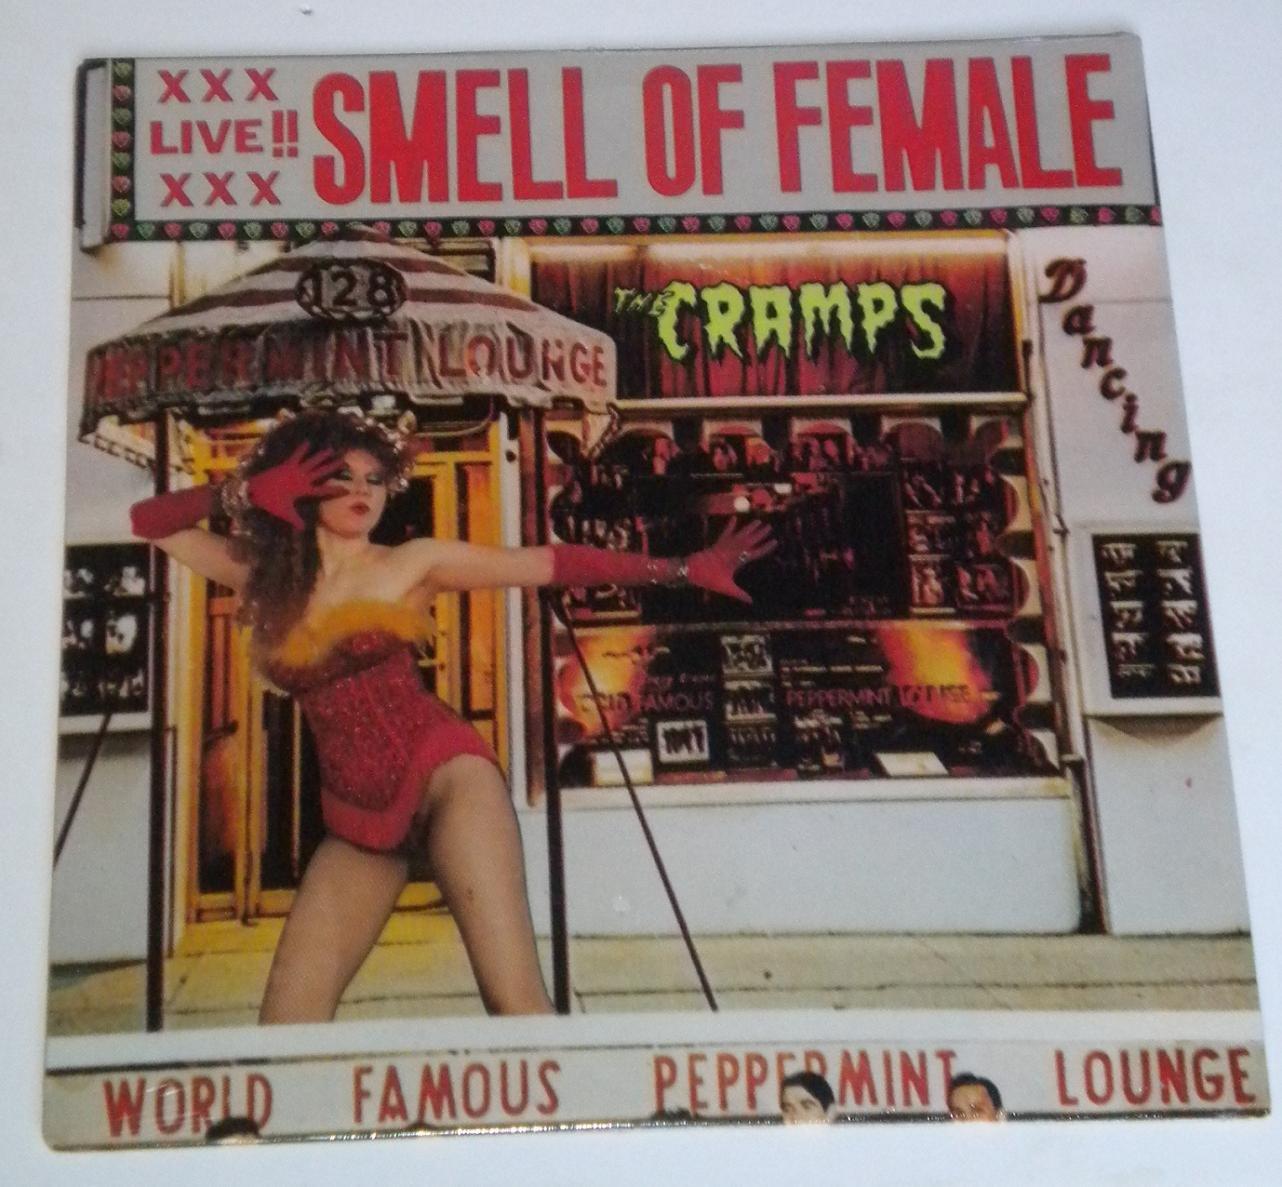 Smell of Female by Dutch East Wax Enigma